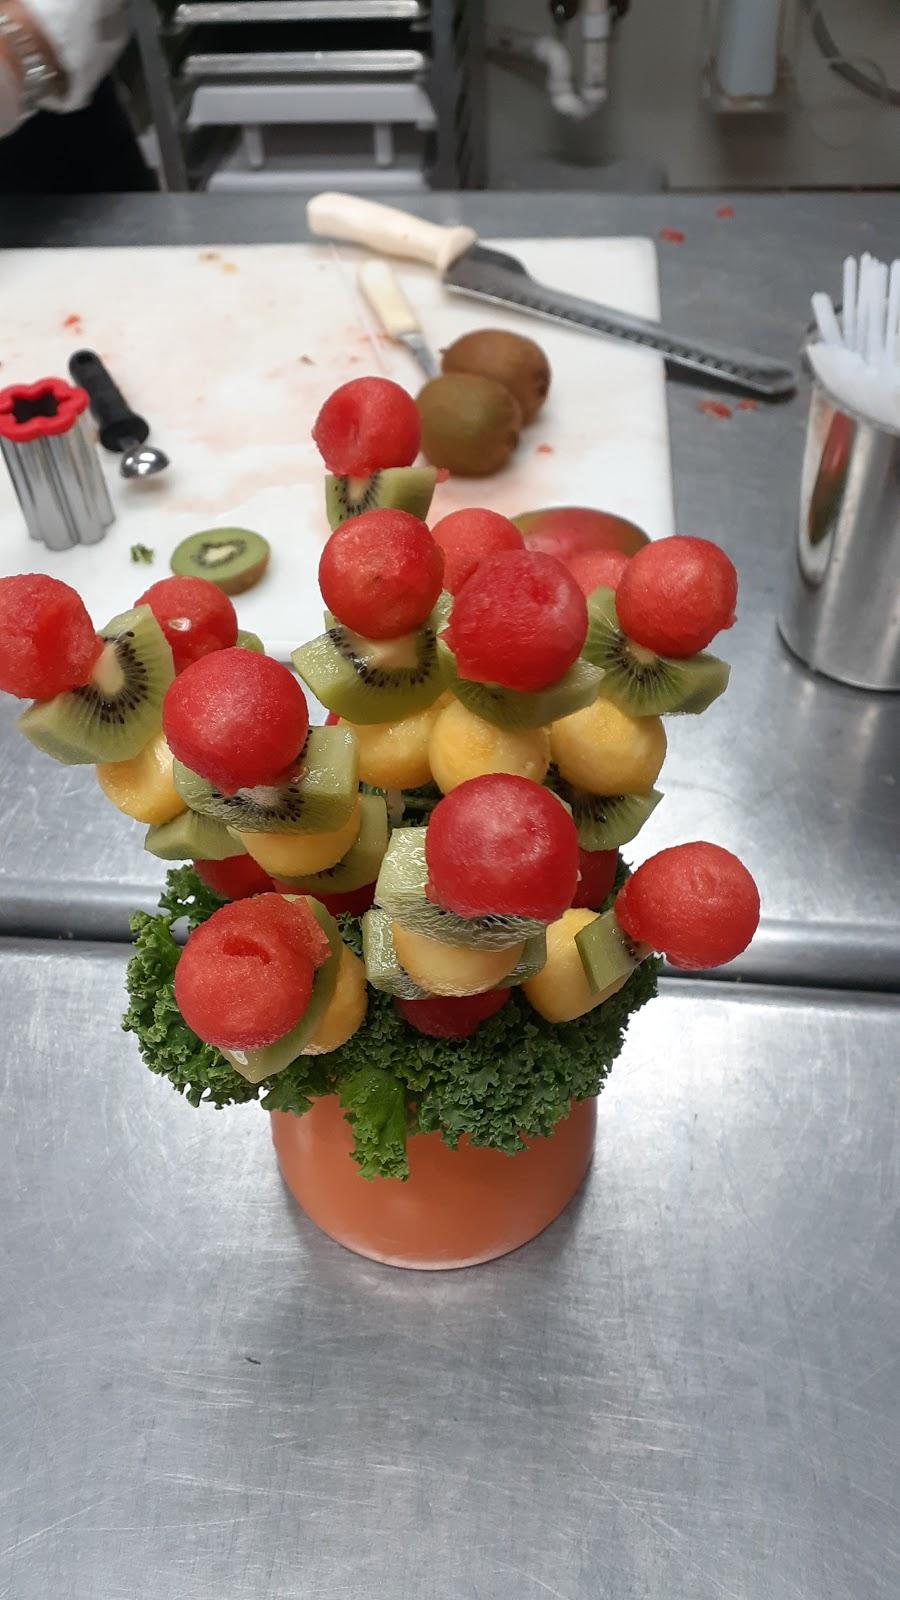 Edible Arrangements - florist    Photo 5 of 10   Address: 1120 N Fielder Rd, Arlington, TX 76012, USA   Phone: (817) 804-1106